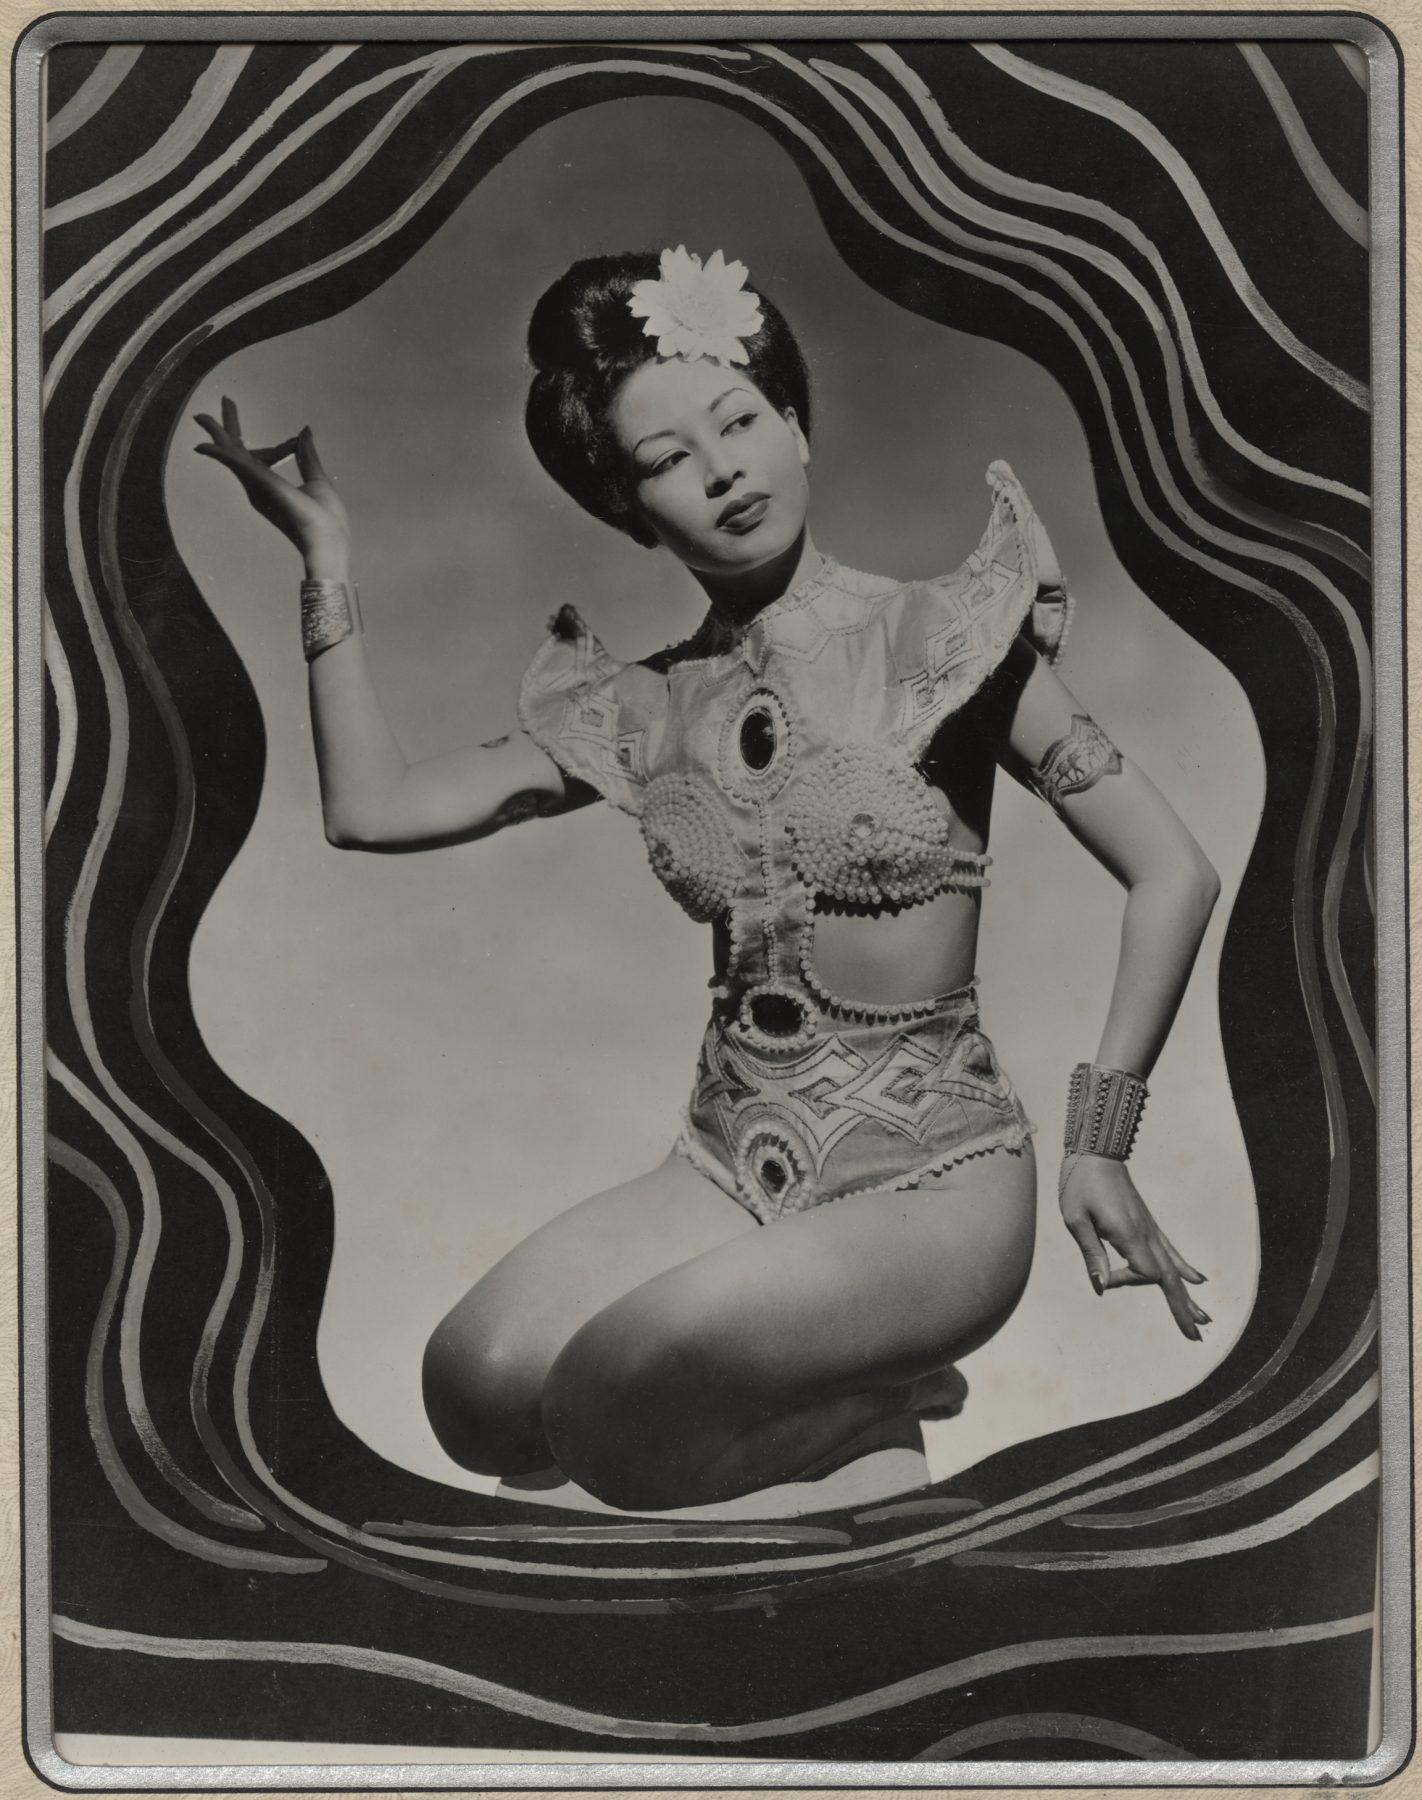 16 May 2019 Posted. Ming Chu Posing in Costume, Gift of Ming Chu Hohloch, Museum of Chinese in America (MOCA) Collection. 赵明身着演出服的舞姿,赵明捐赠,美国华人博物馆(MOCA)馆藏